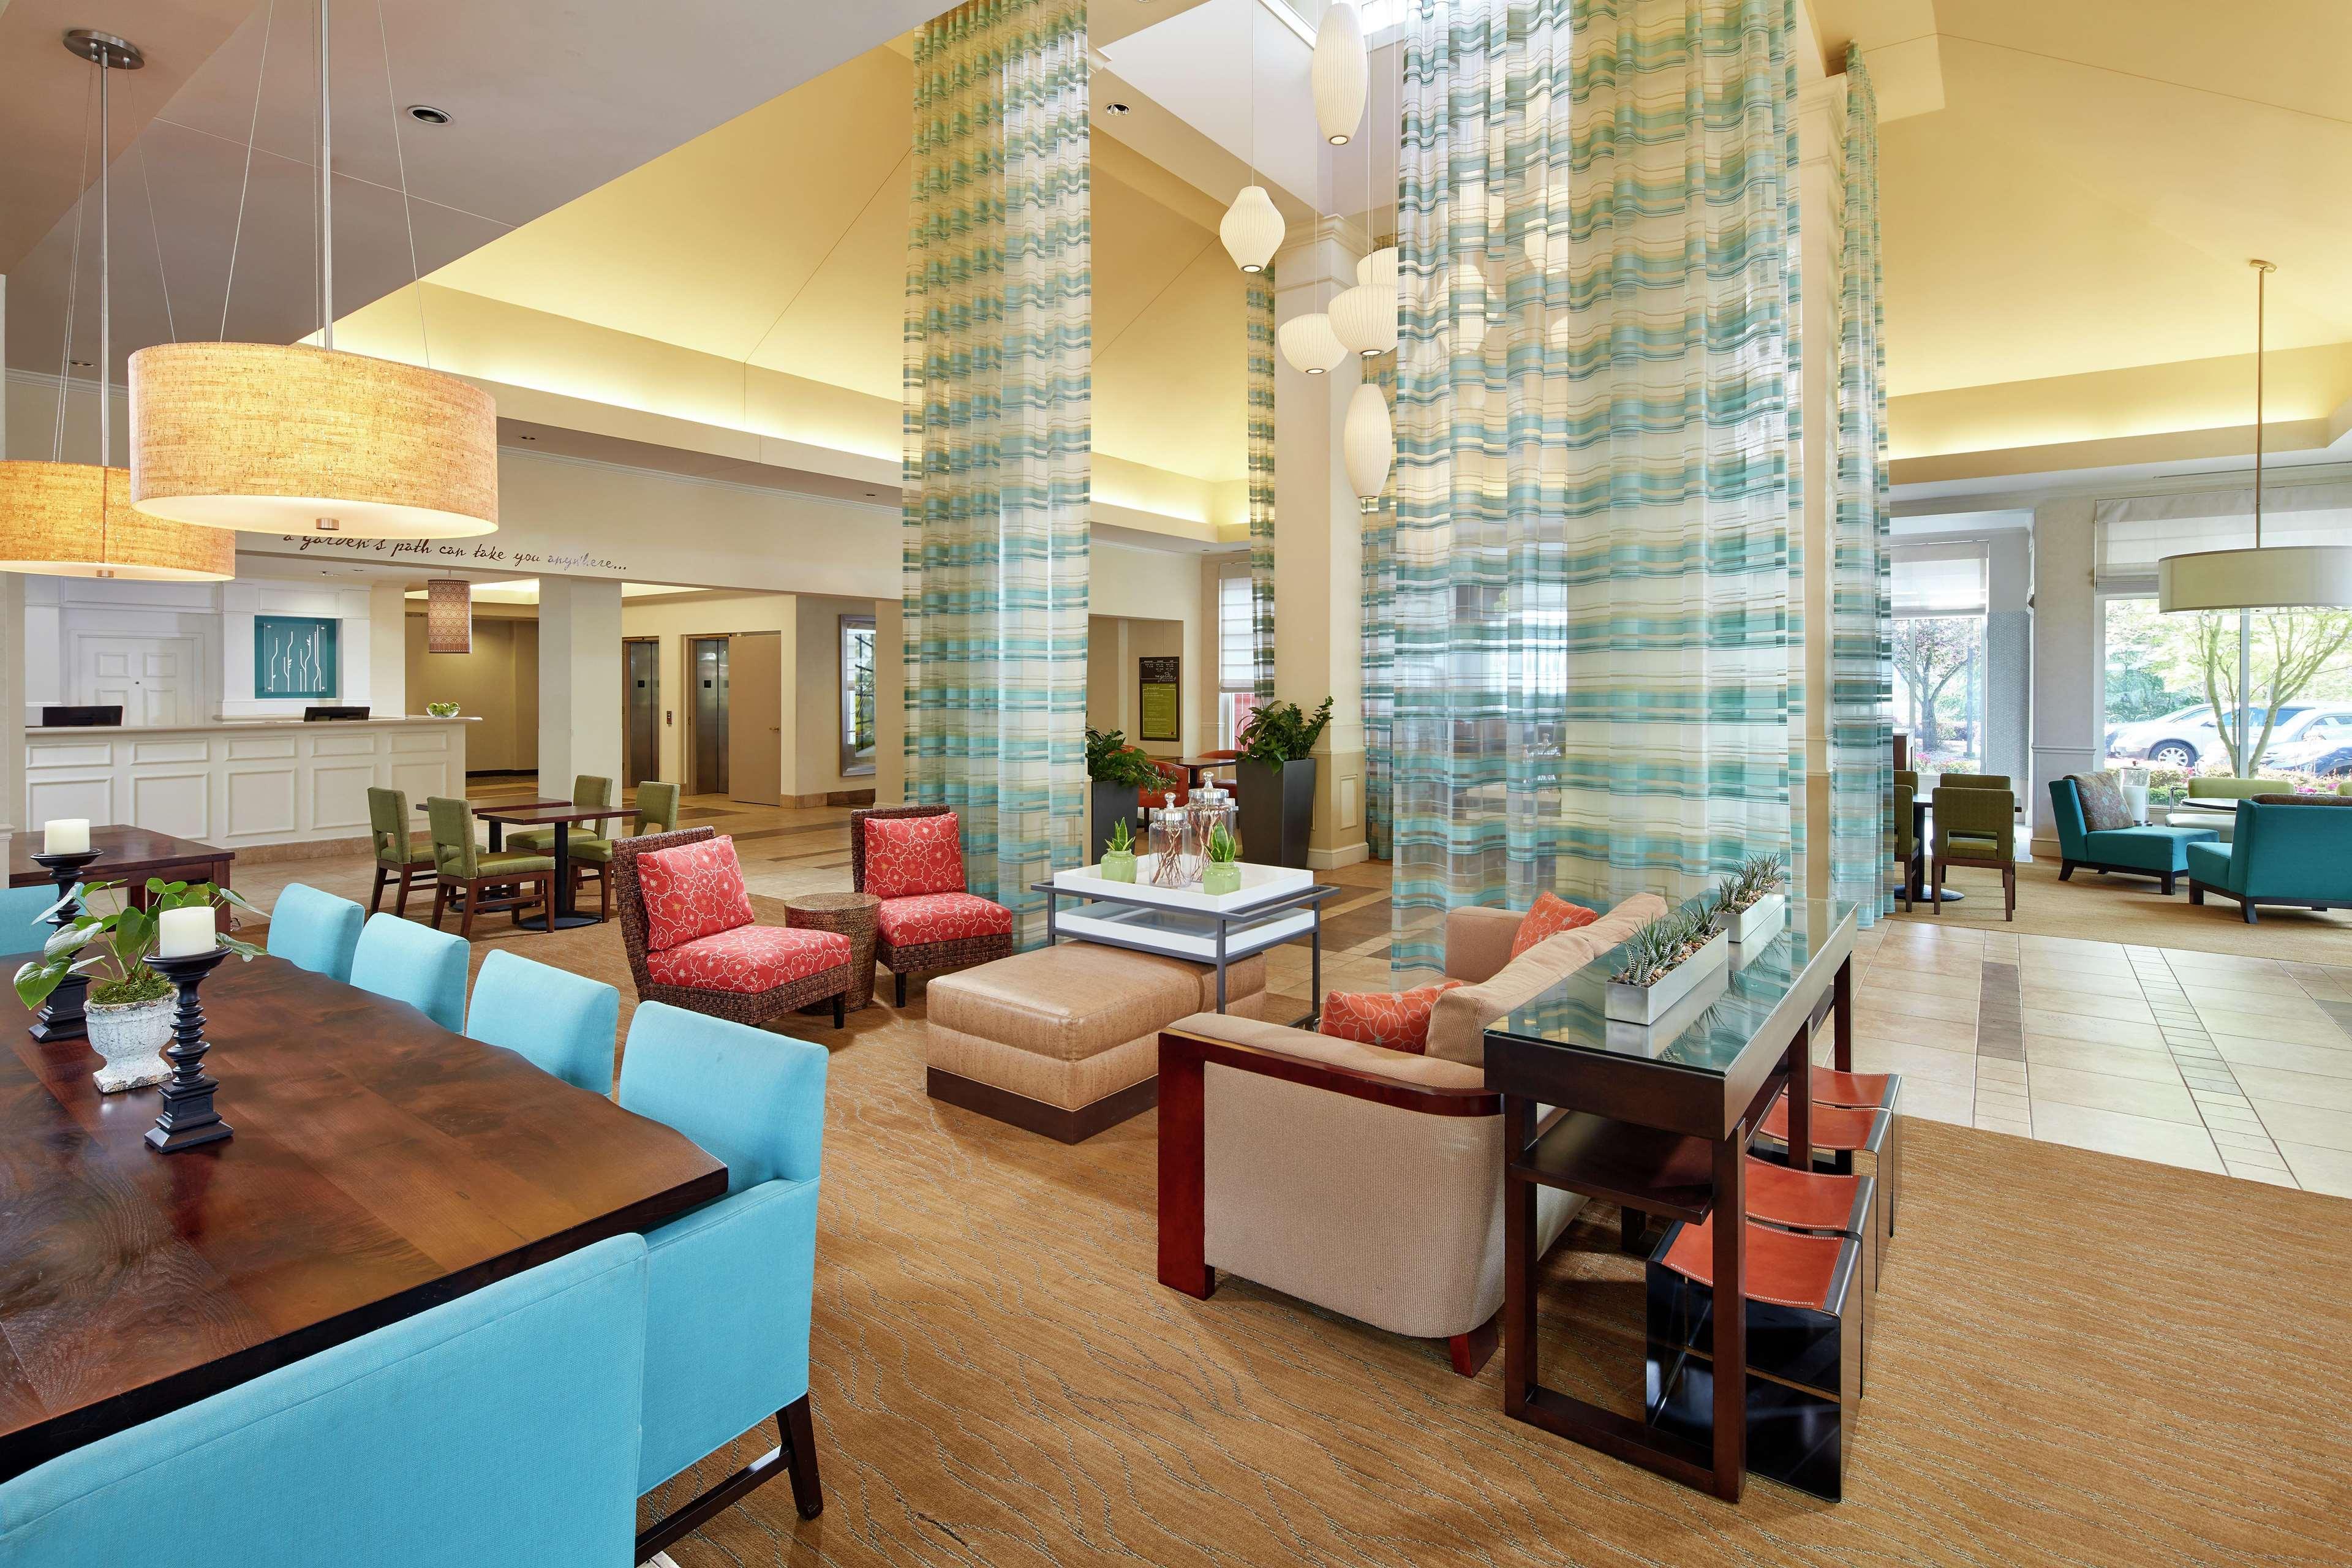 Hilton Garden Inn Portland/Lake Oswego